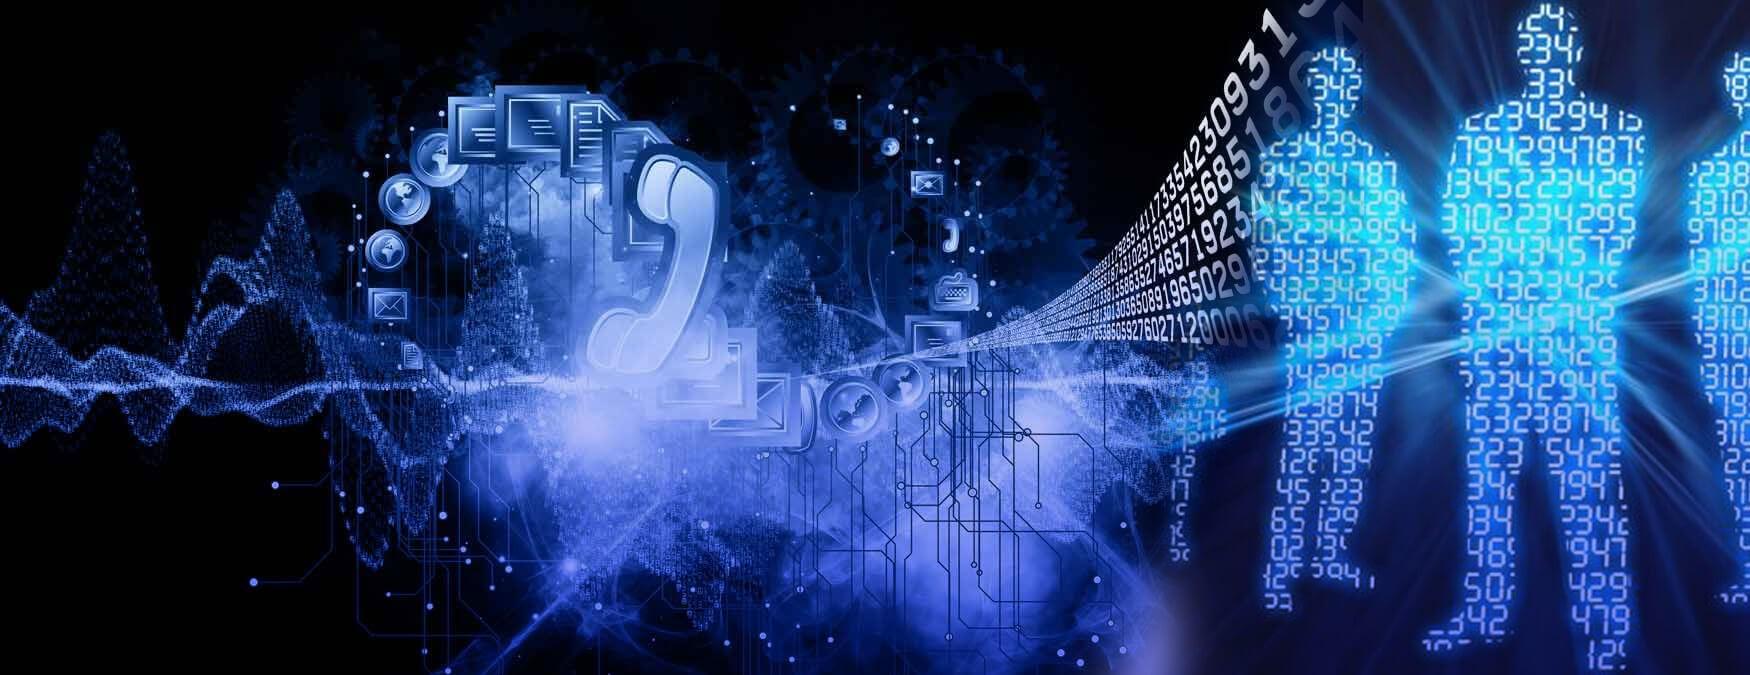 Telecommunications Image - AGR